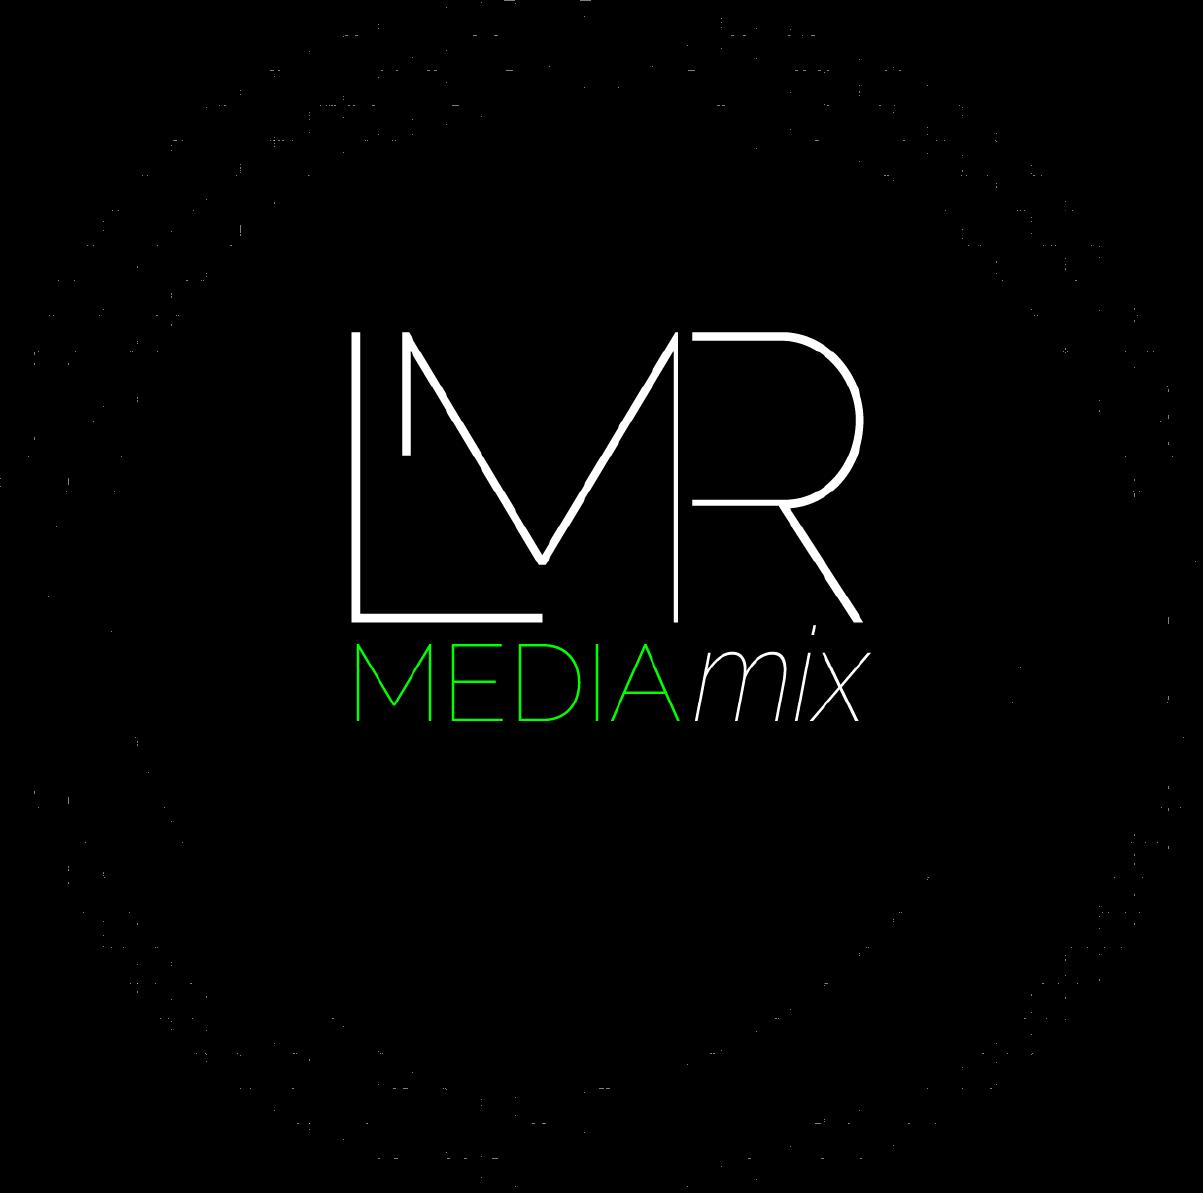 LMR MEDIA mix